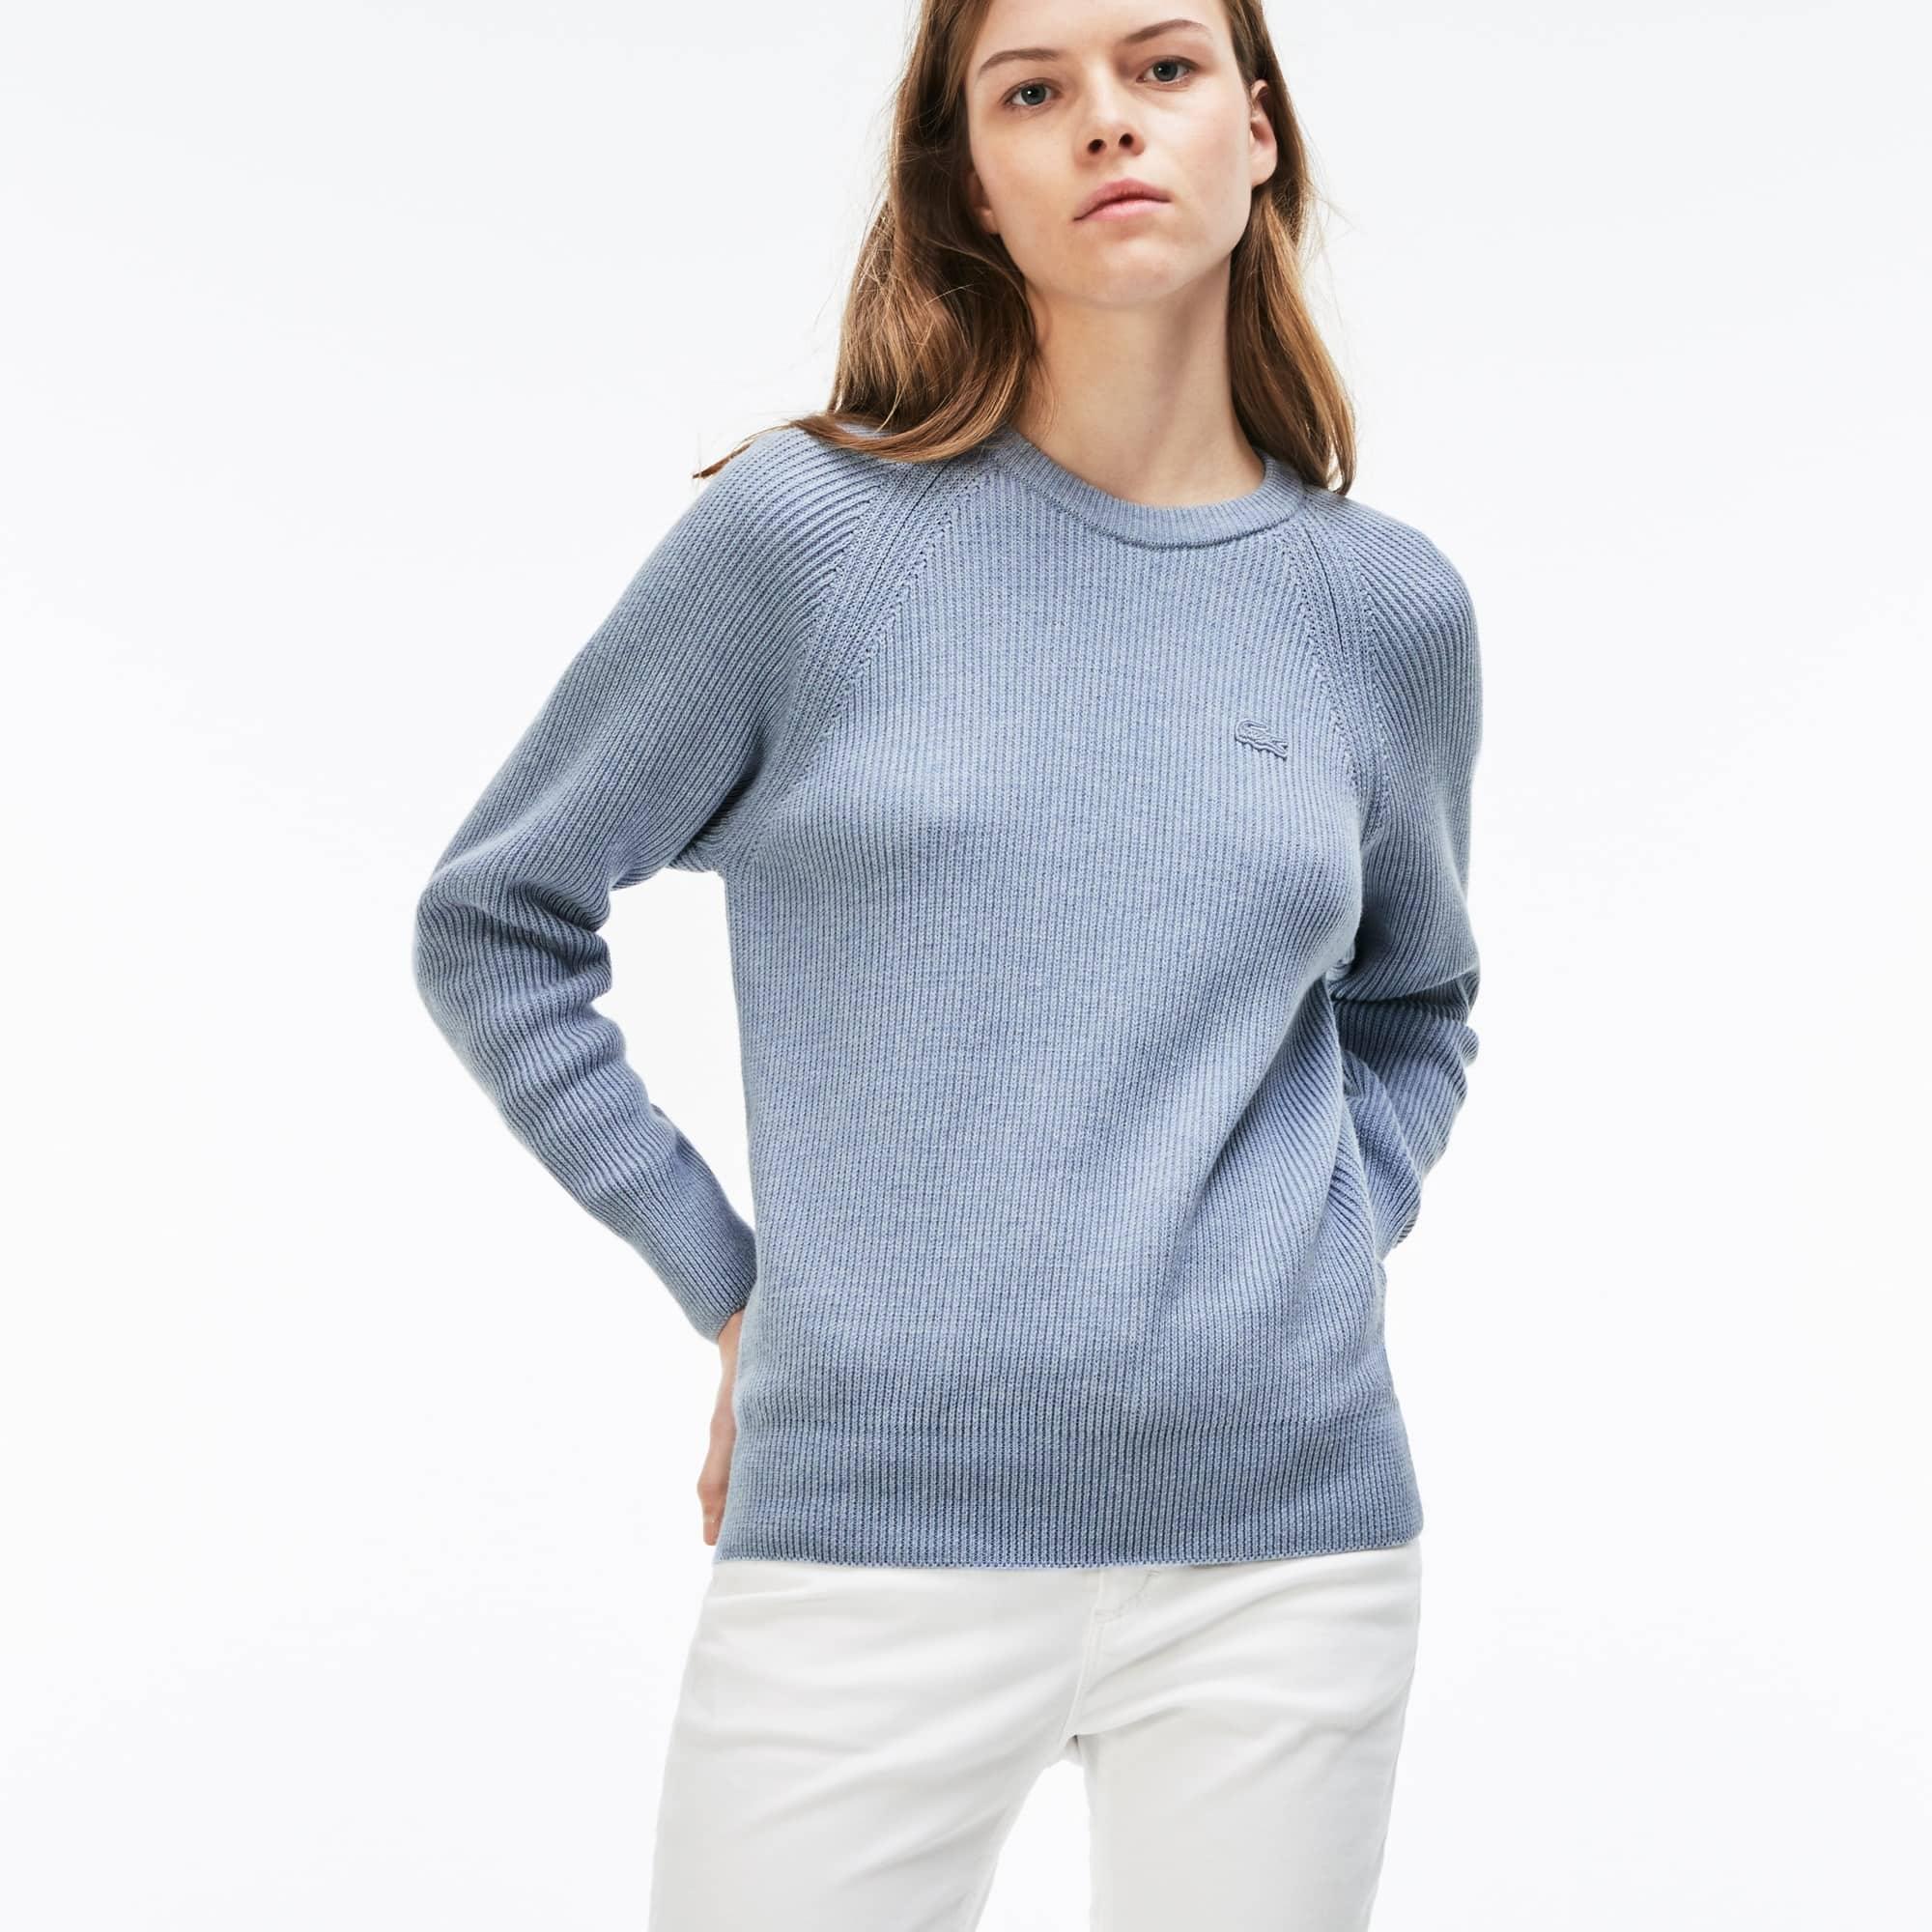 Sweater dames ronde hals geribd katoen en wol